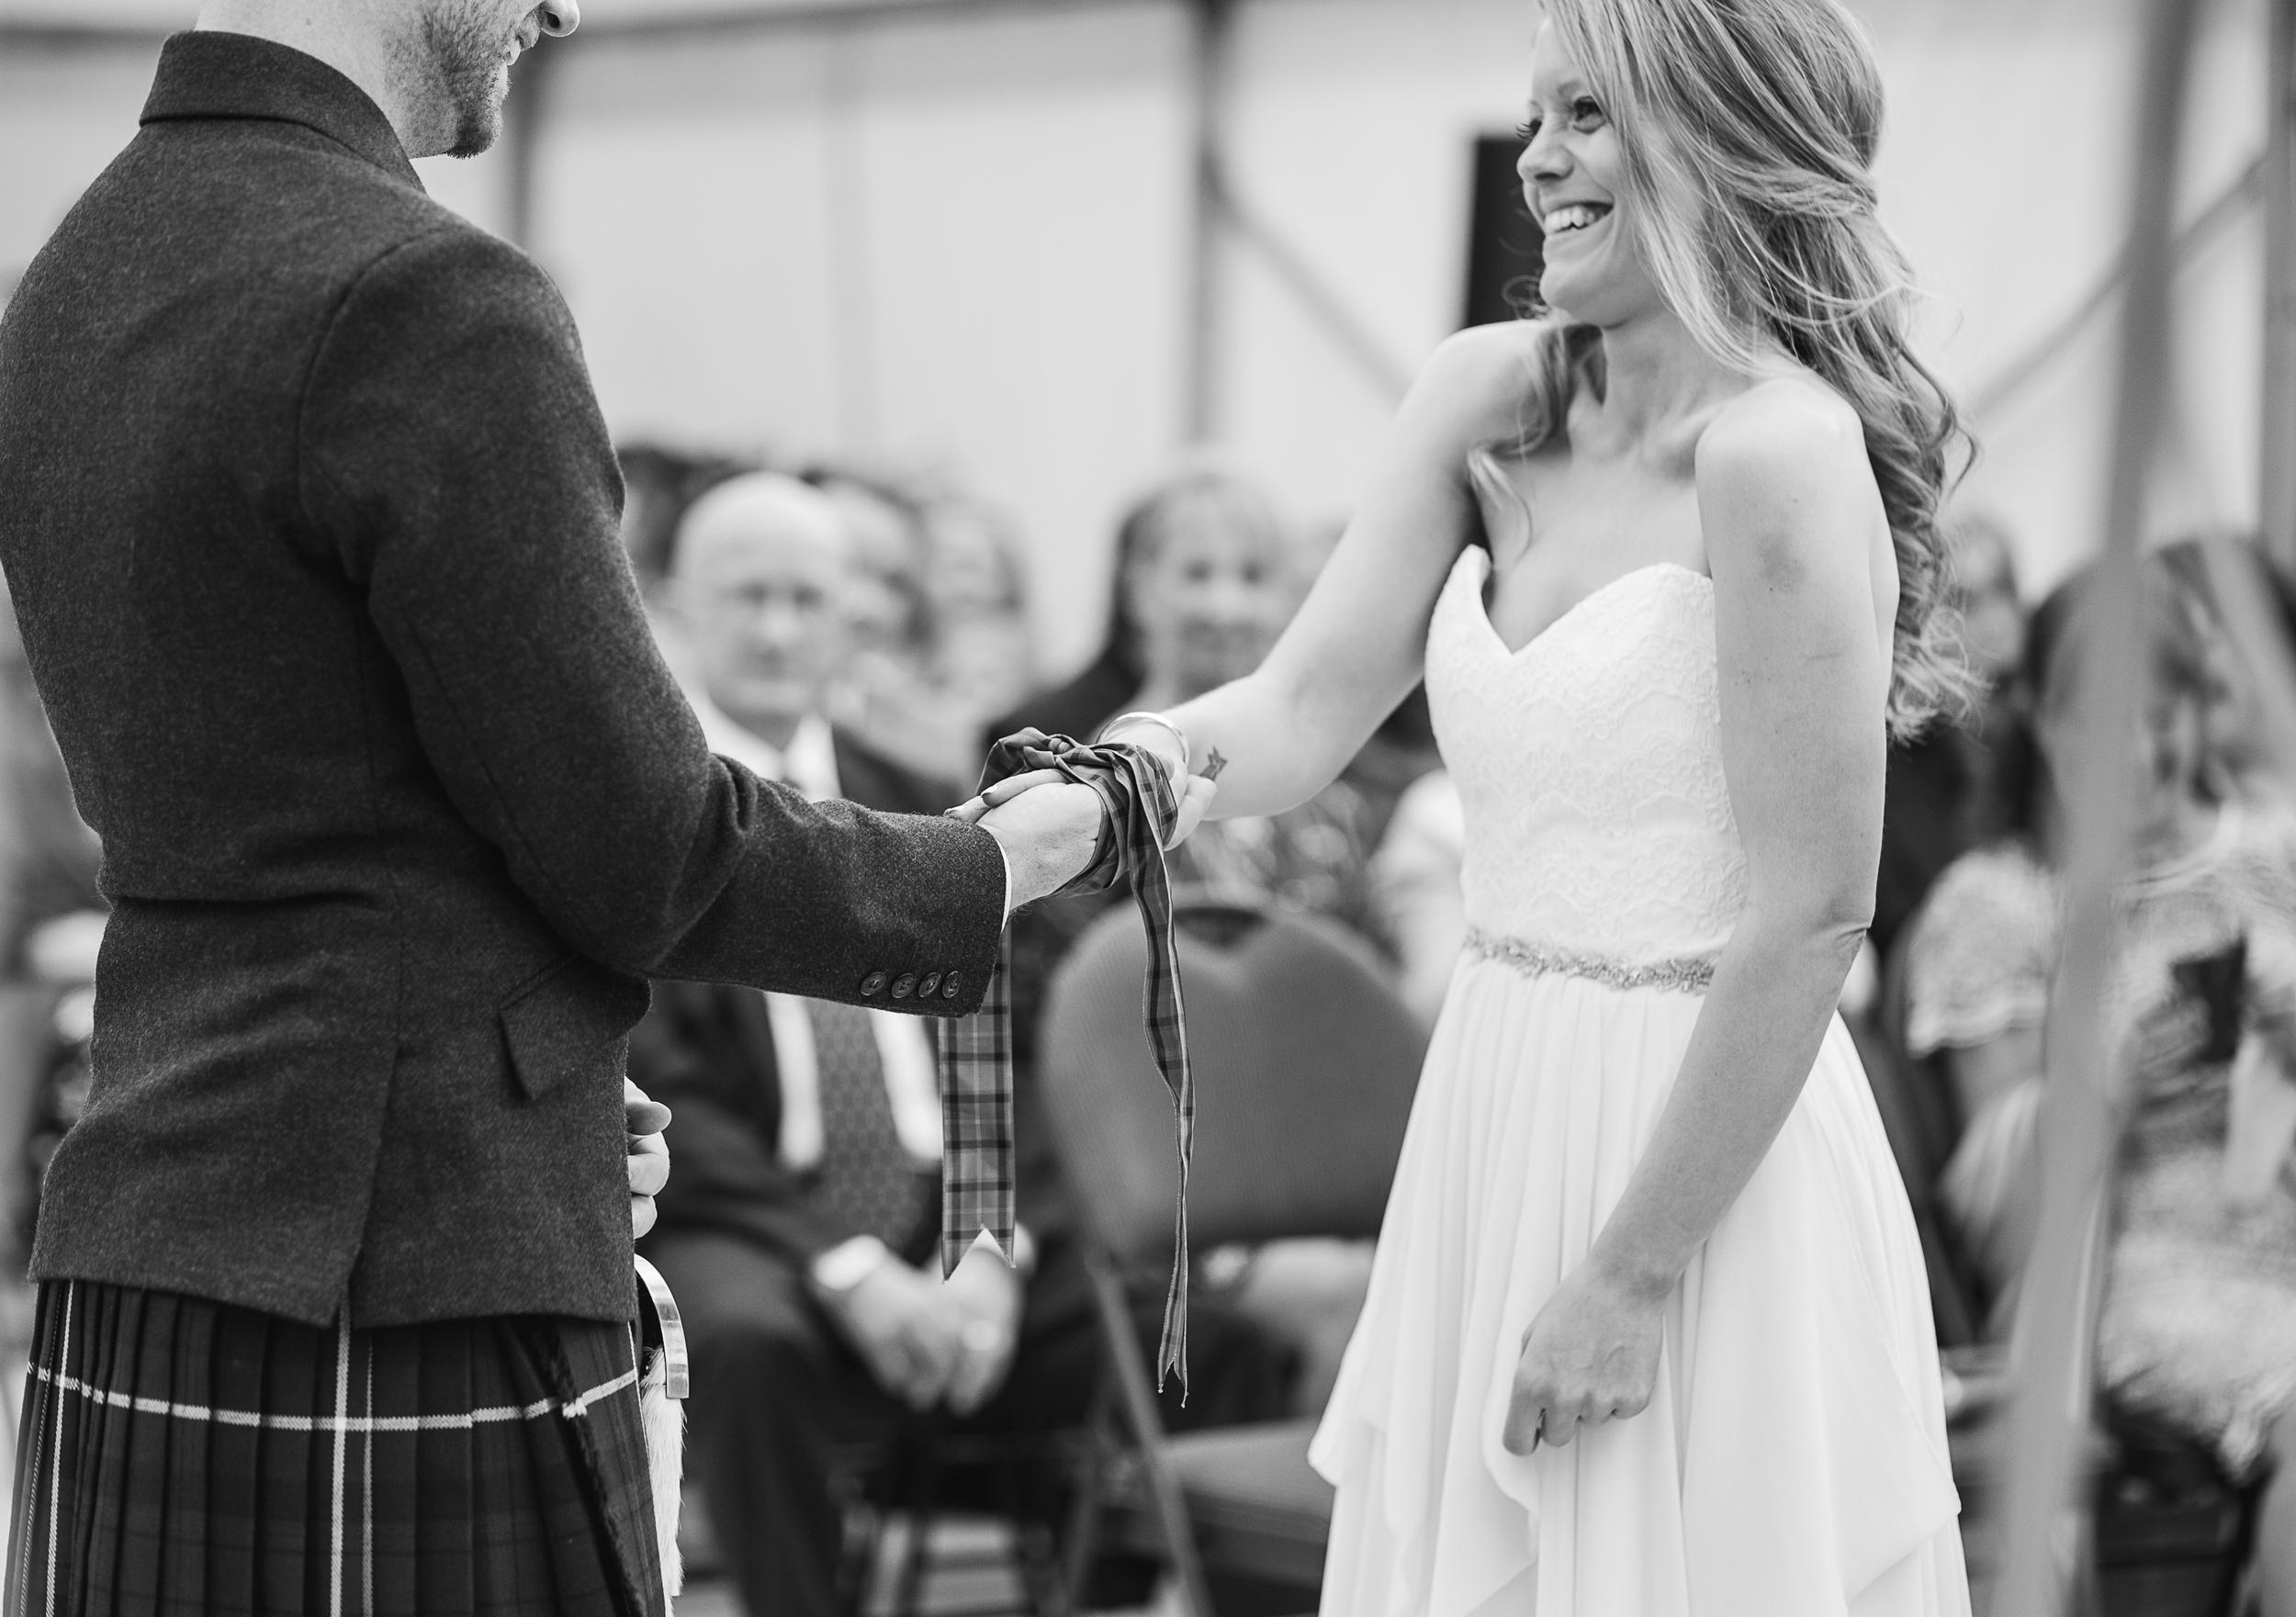 weddingphotographyaberdeen-14.jpg